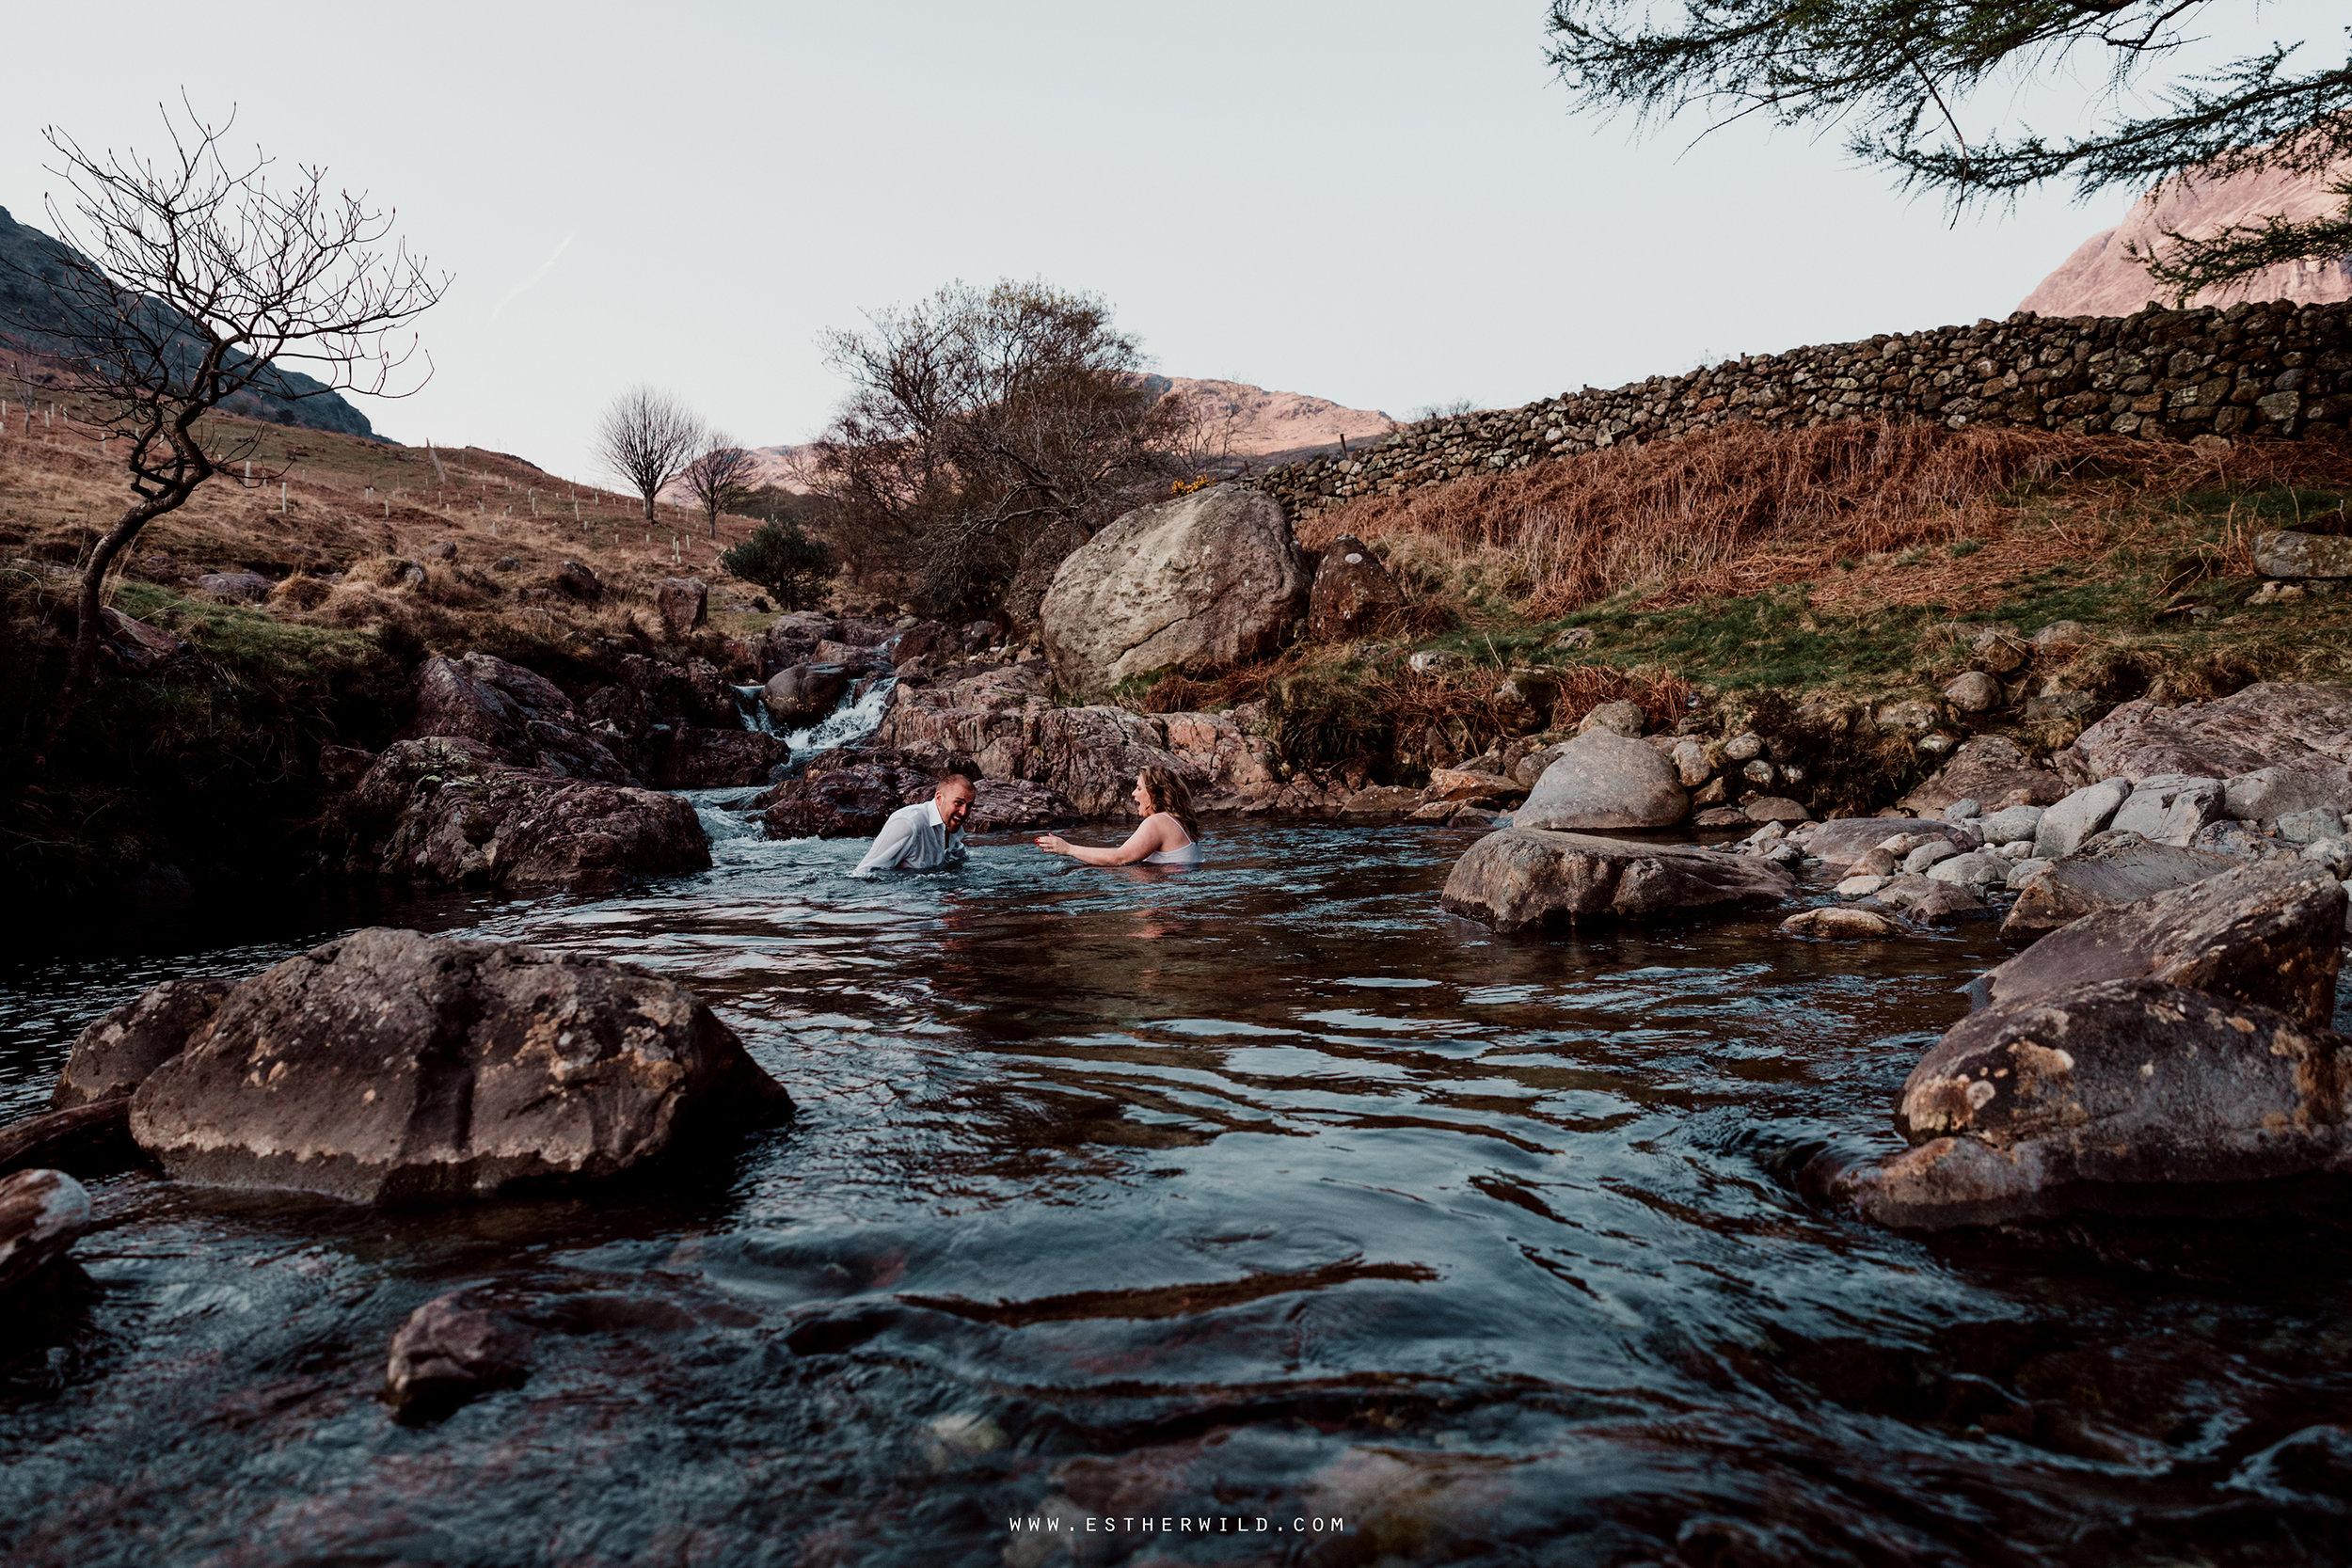 Cumbria_Lake_District_Wasdale_Wedding_Photographer_Destination_Engagement_Anniversary_Esther_Wild_IMG_4392.jpg